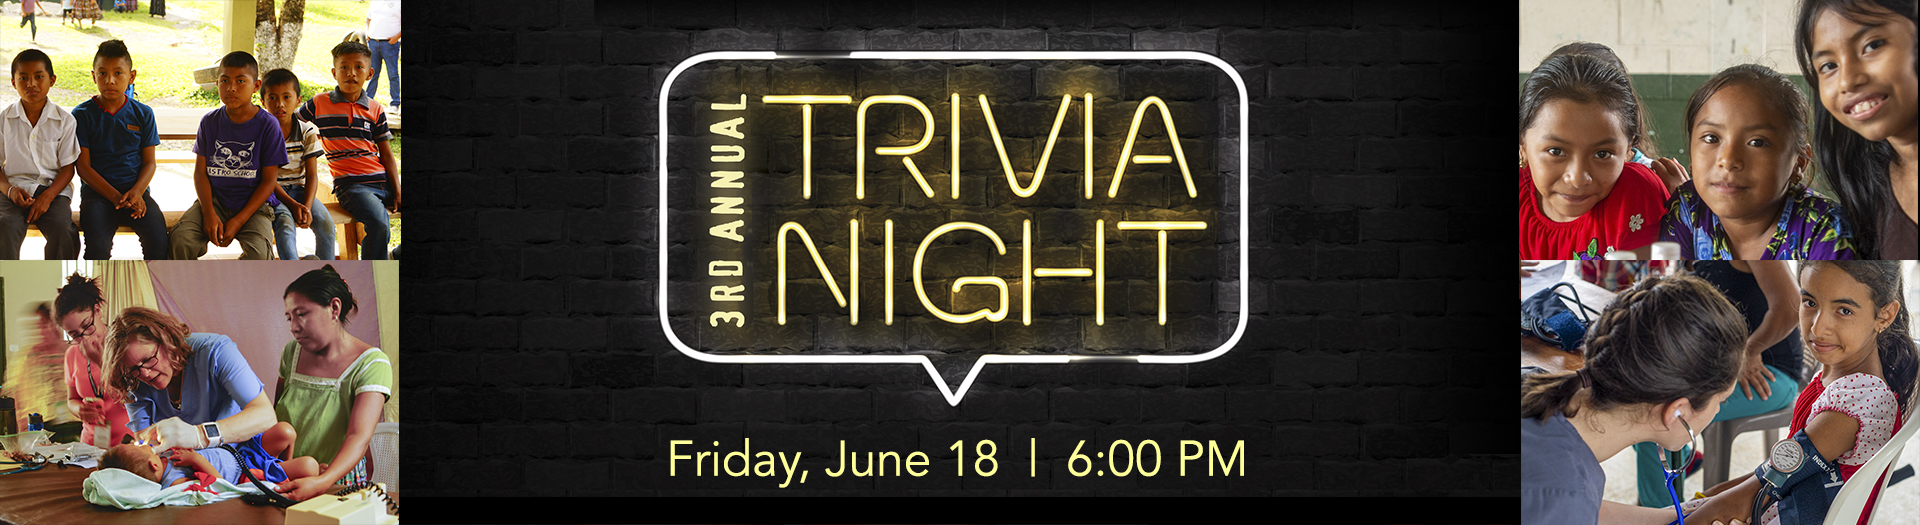 Third Annual Trivia Night